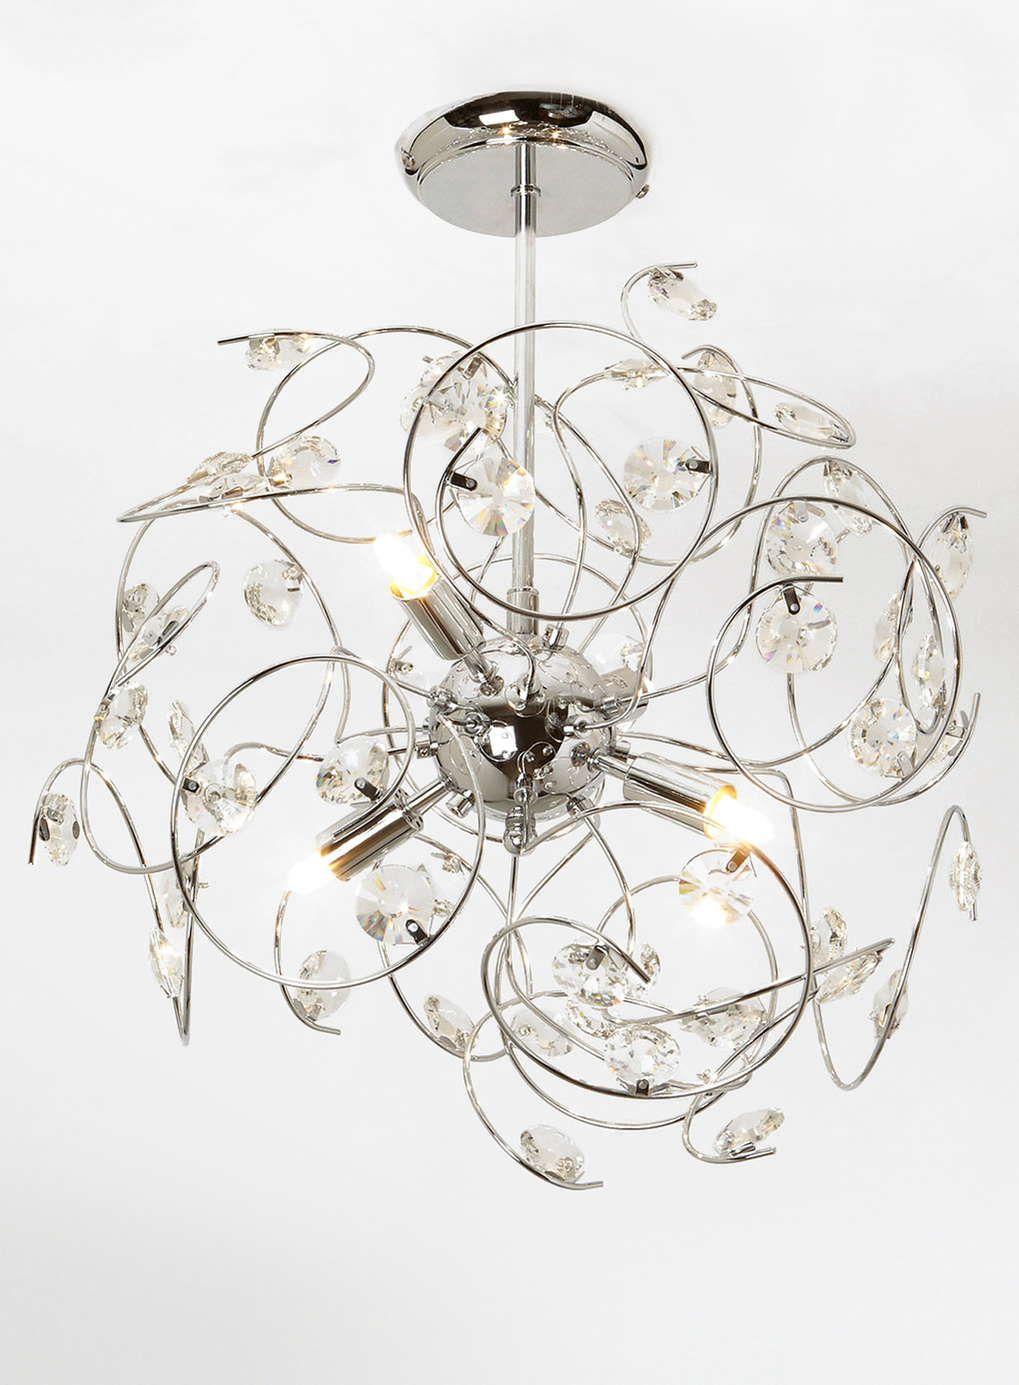 Lila sputnik flush ceiling light bhs living the dream lila sputnik flush ceiling light bhs aloadofball Choice Image